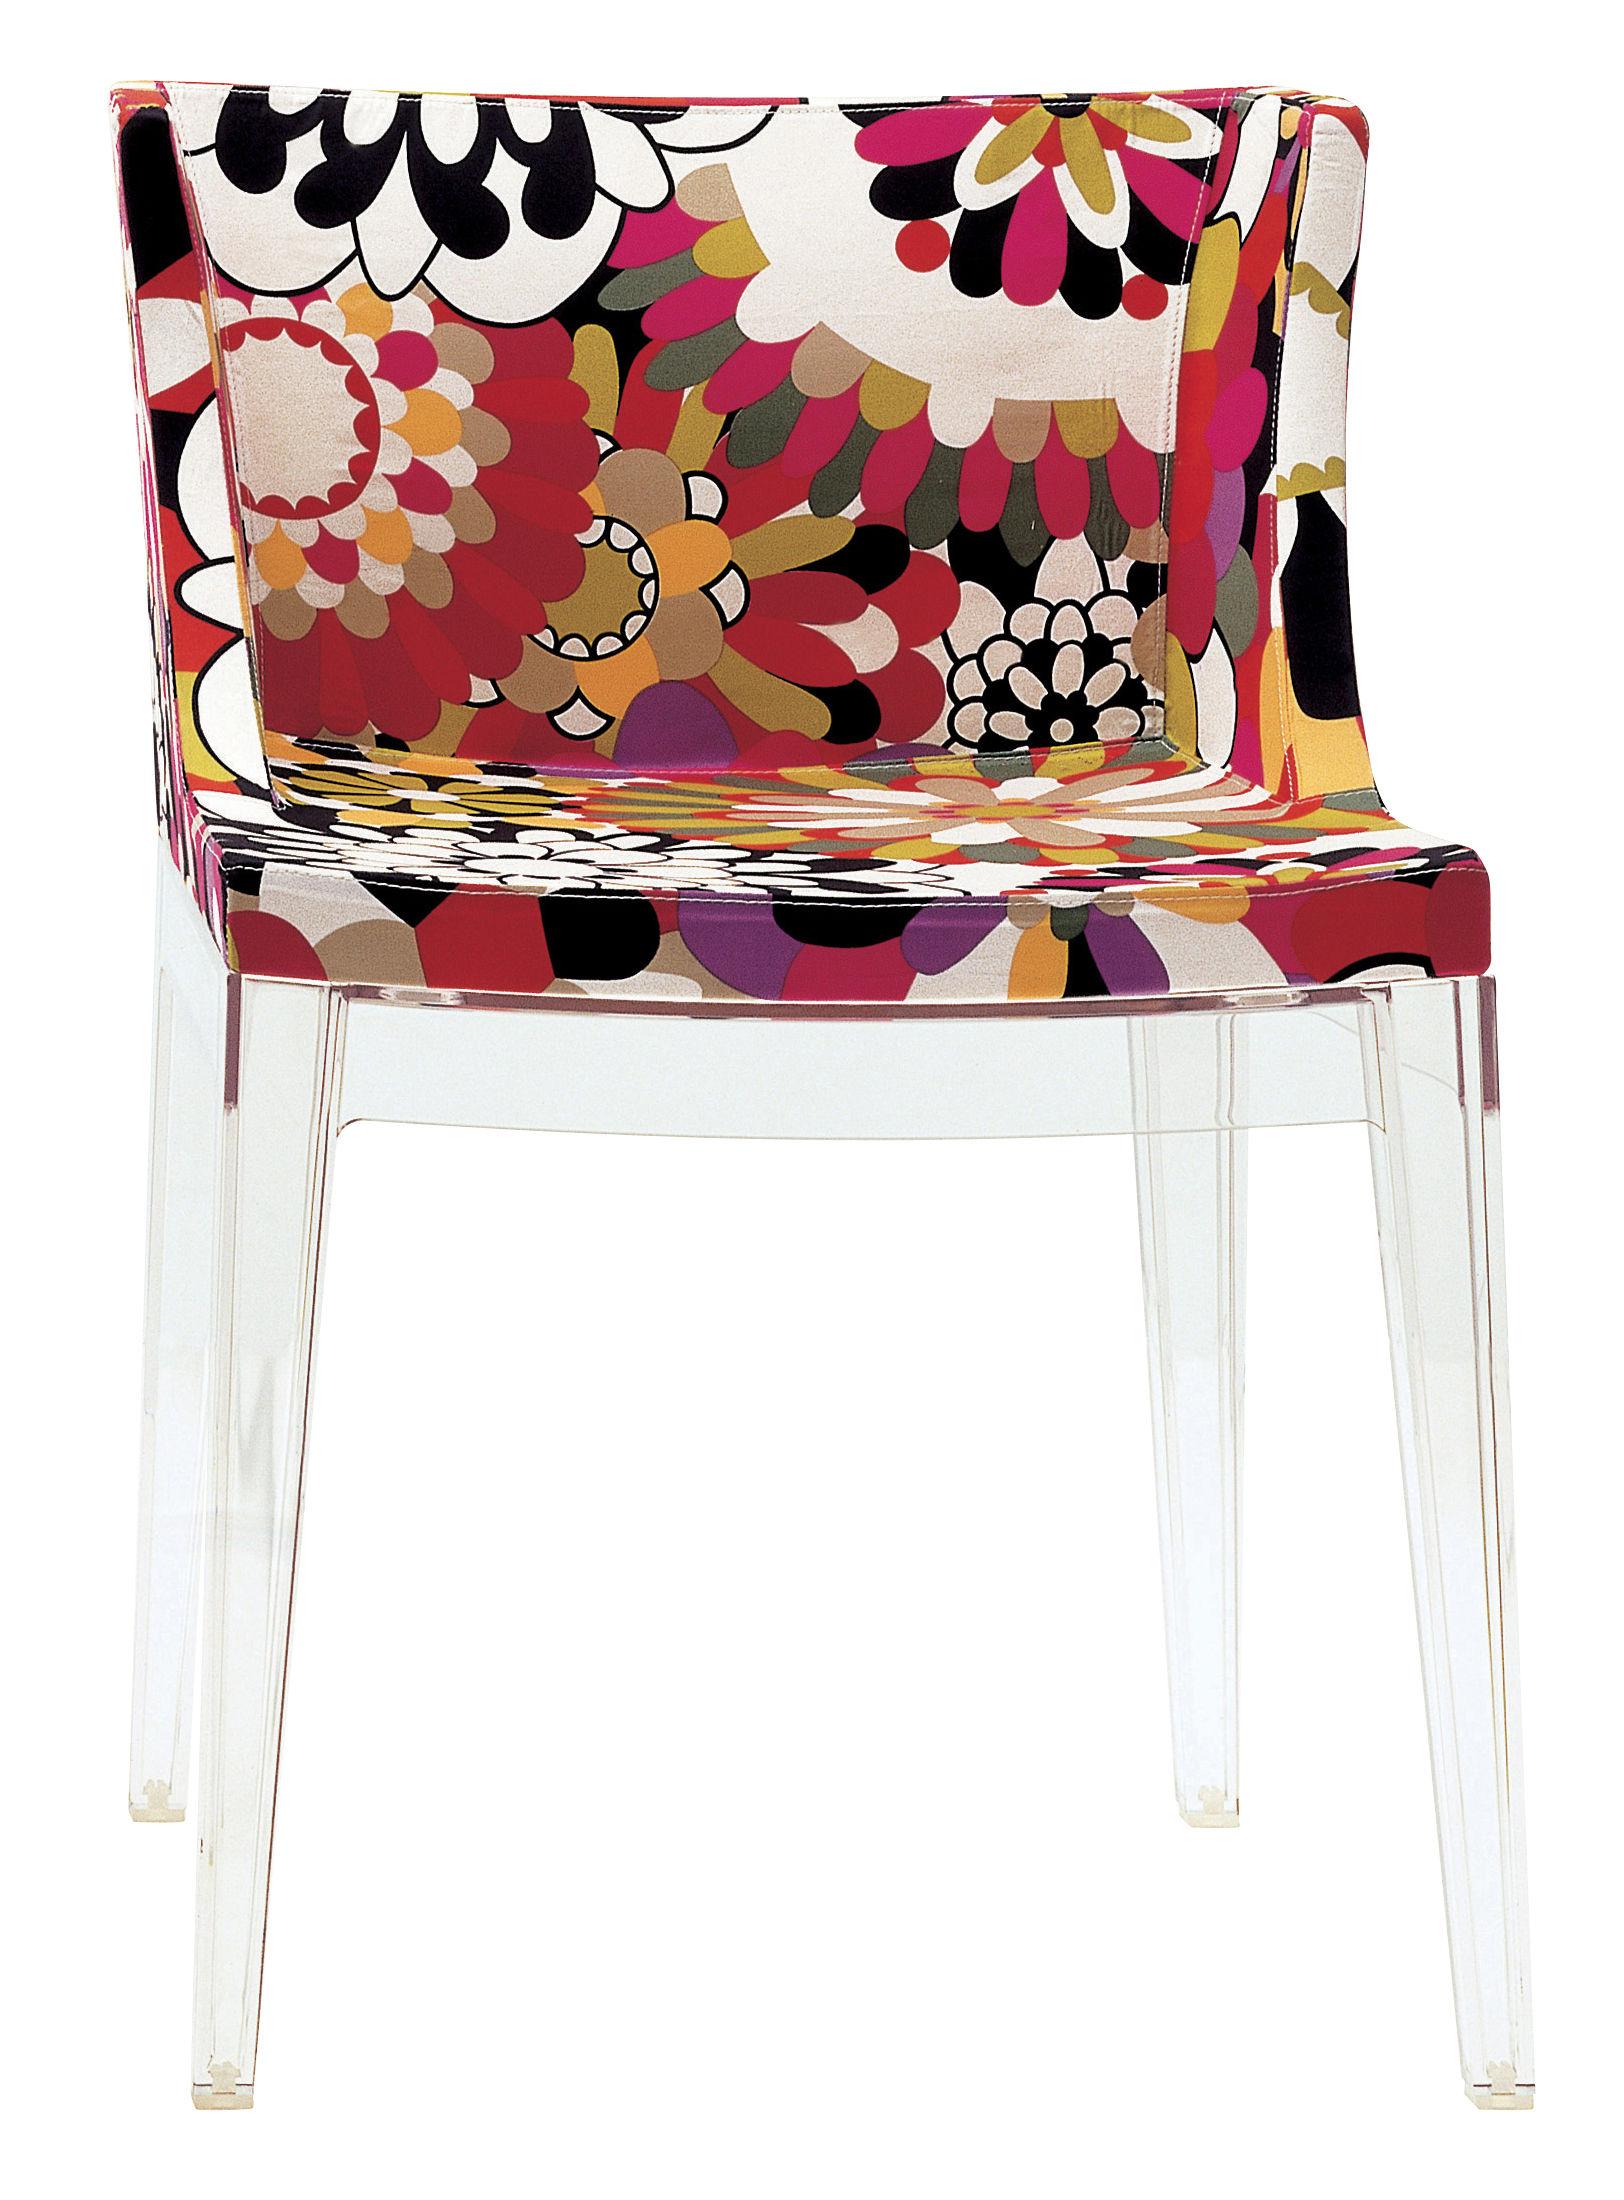 fauteuil rembourr mademoiselle missoni tissu pieds transparents fleurs tons rouges kartell. Black Bedroom Furniture Sets. Home Design Ideas